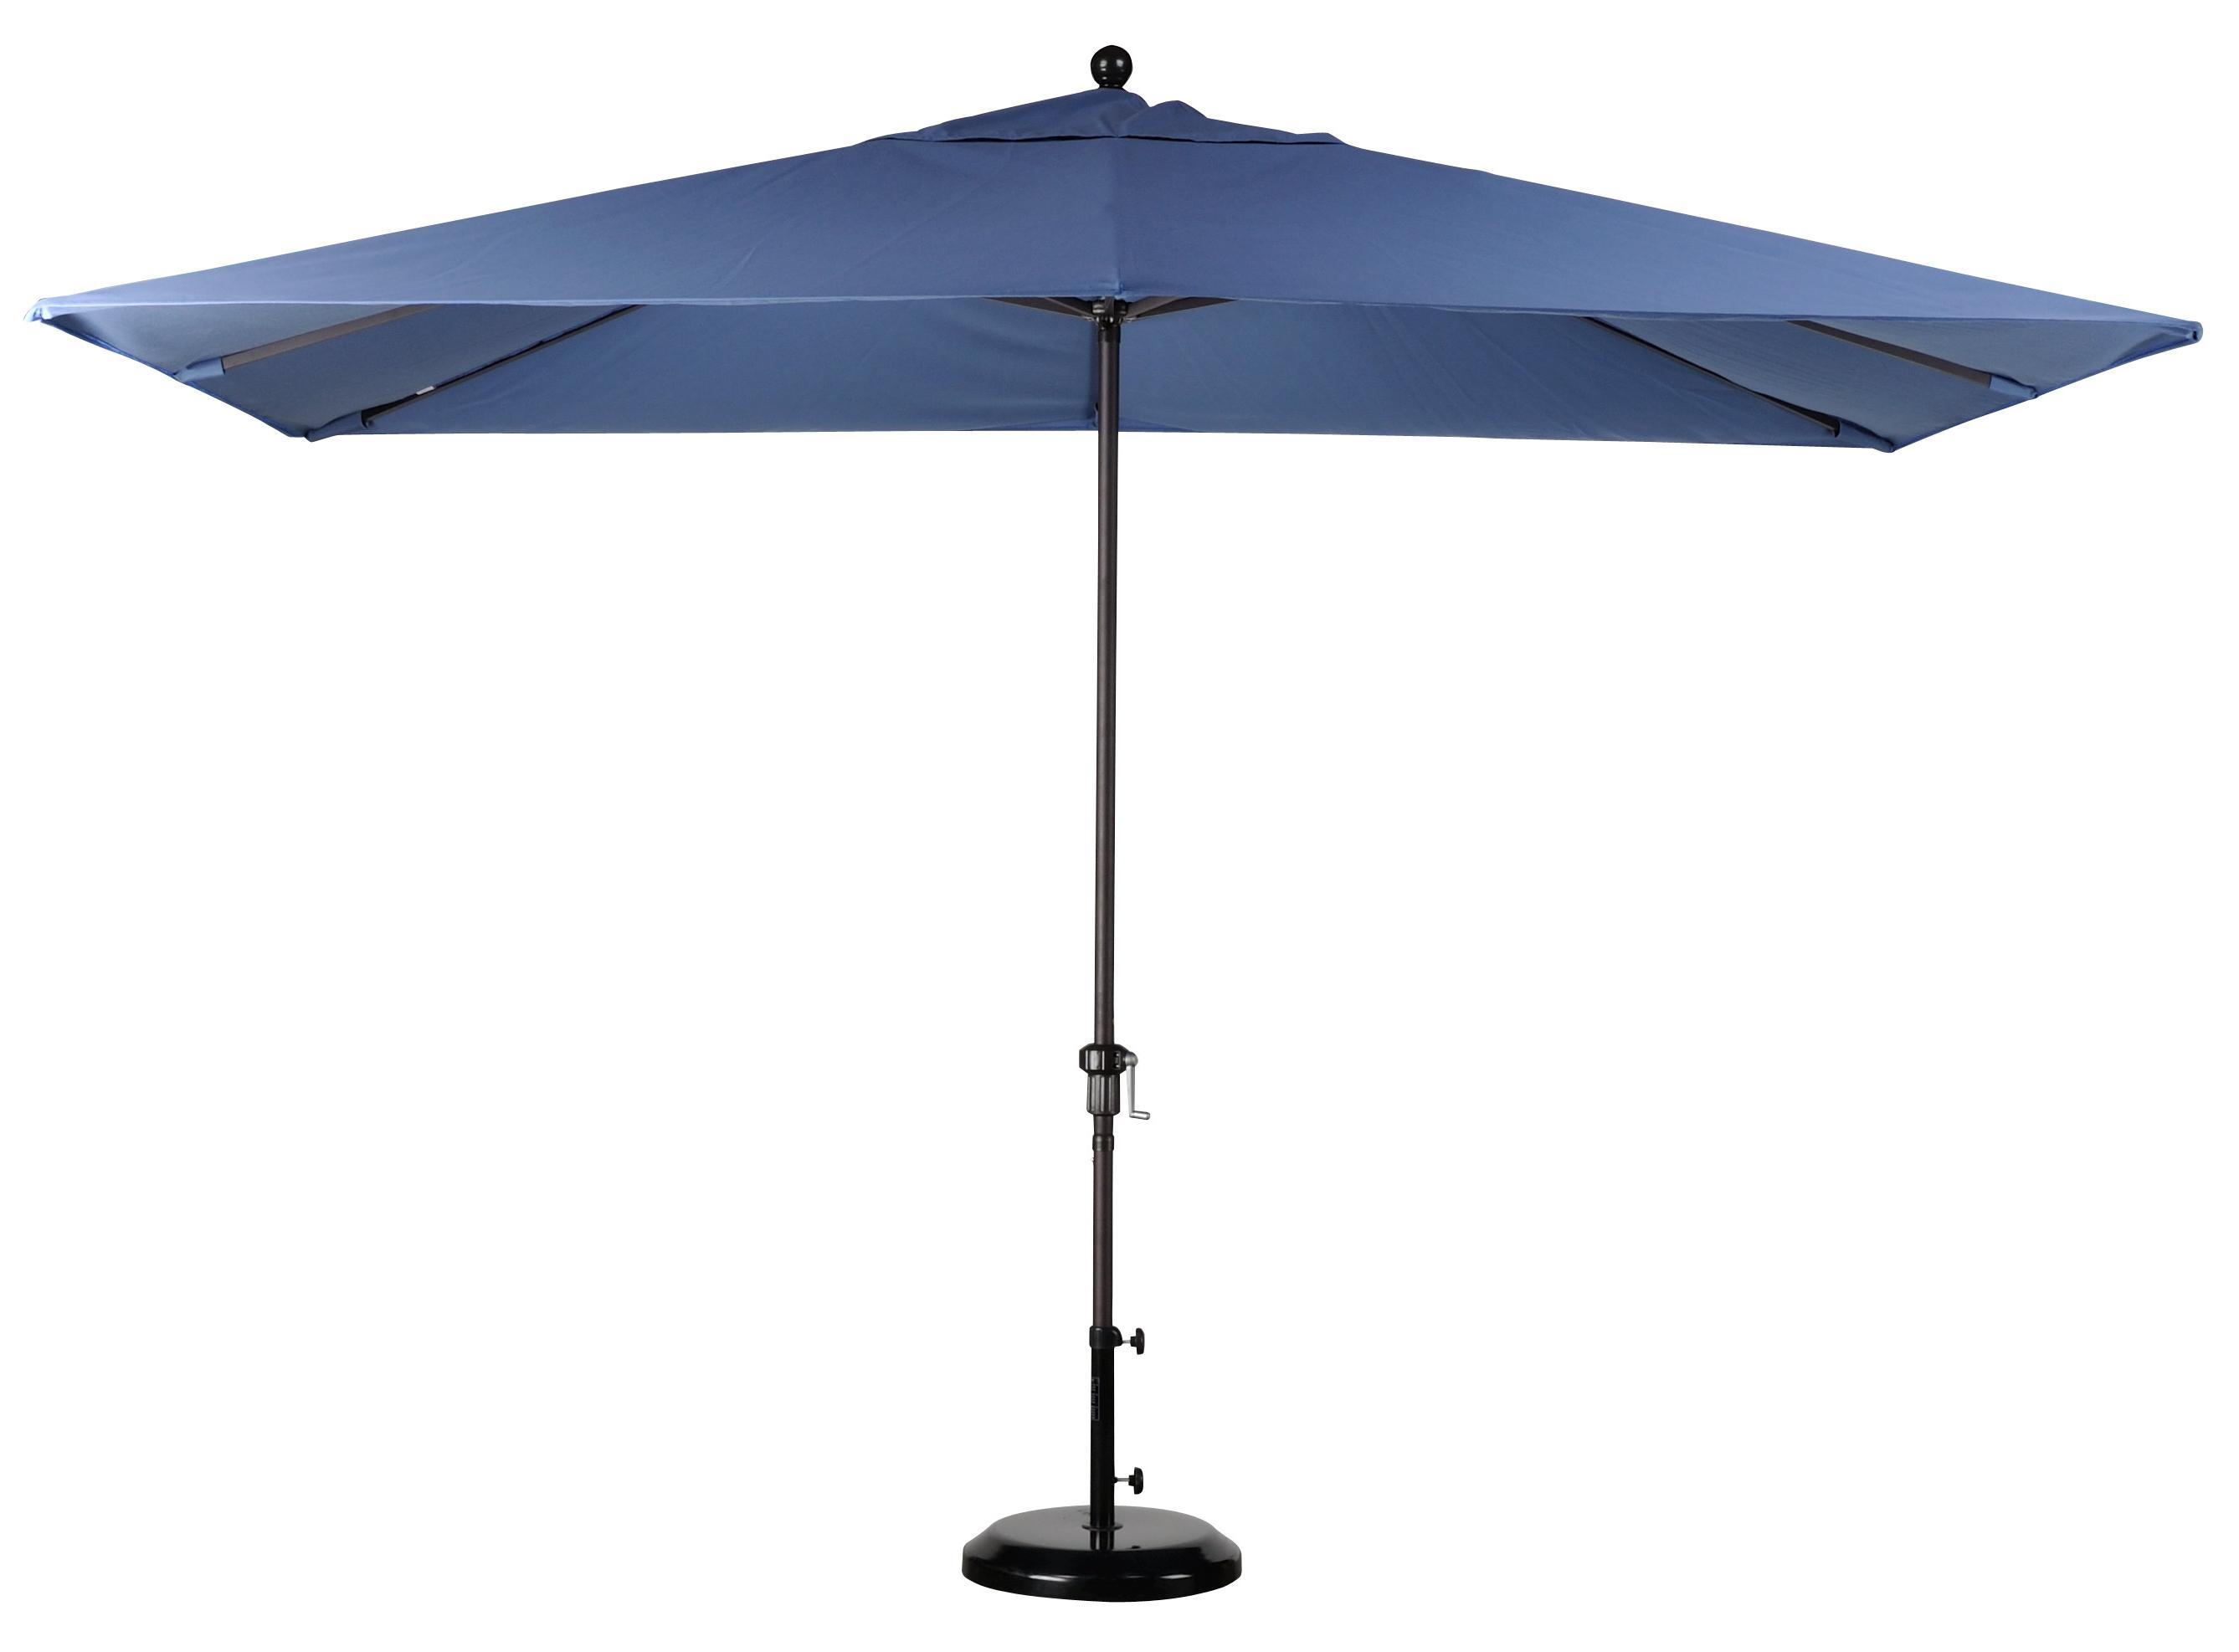 Most Recent Mald Square Cantilever Umbrellas For Square And Retangular Umbrellas (View 6 of 20)